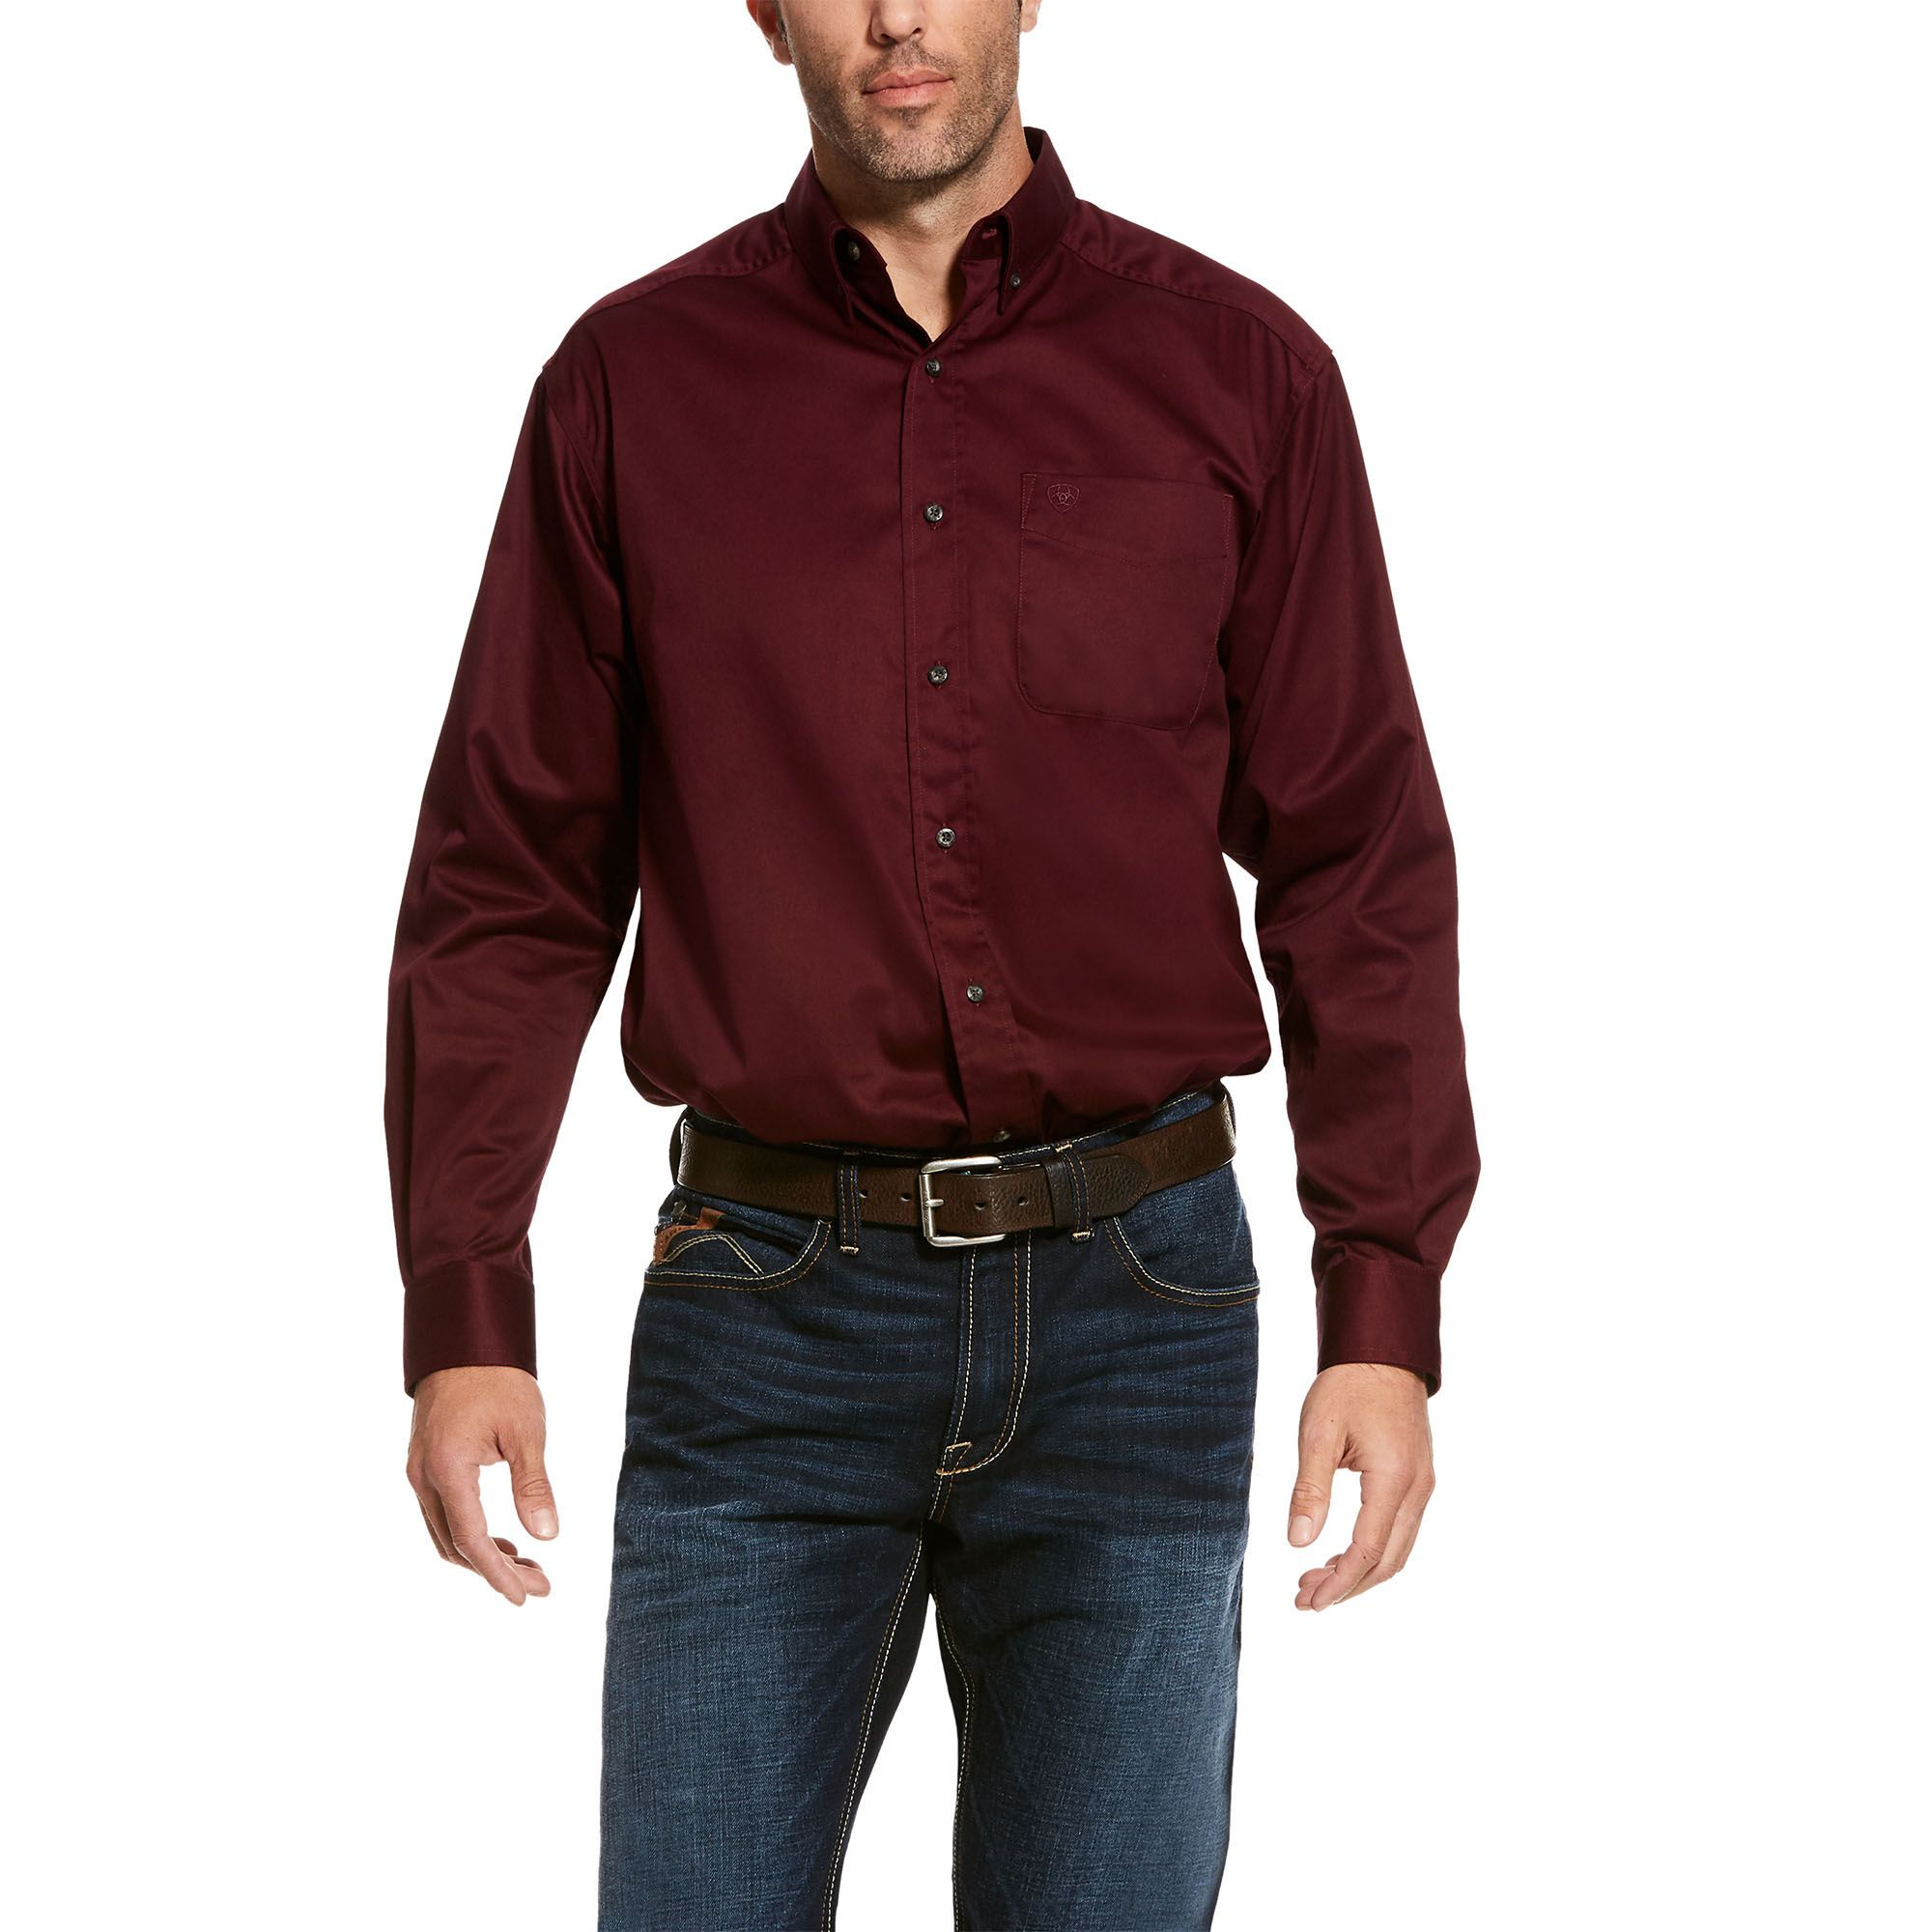 ARIAT Mens Solid Stretch Poplin Shirt